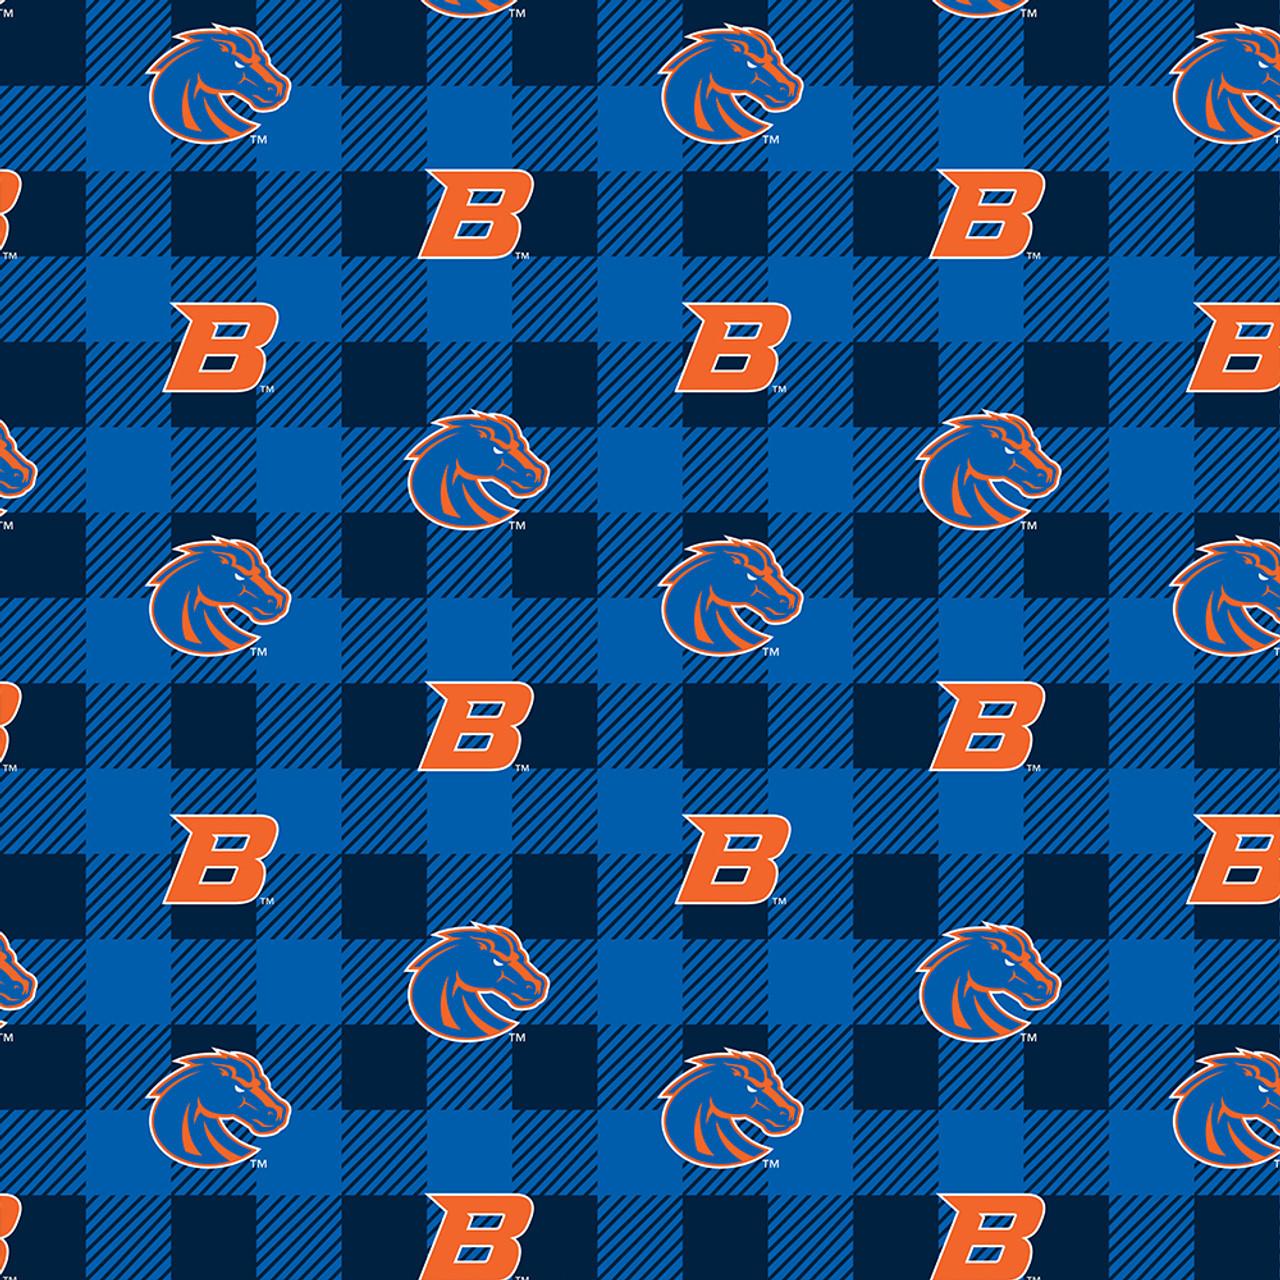 Sykel Enterprises Collegiate Fleece Boise State University Fabric by The Yard Blue